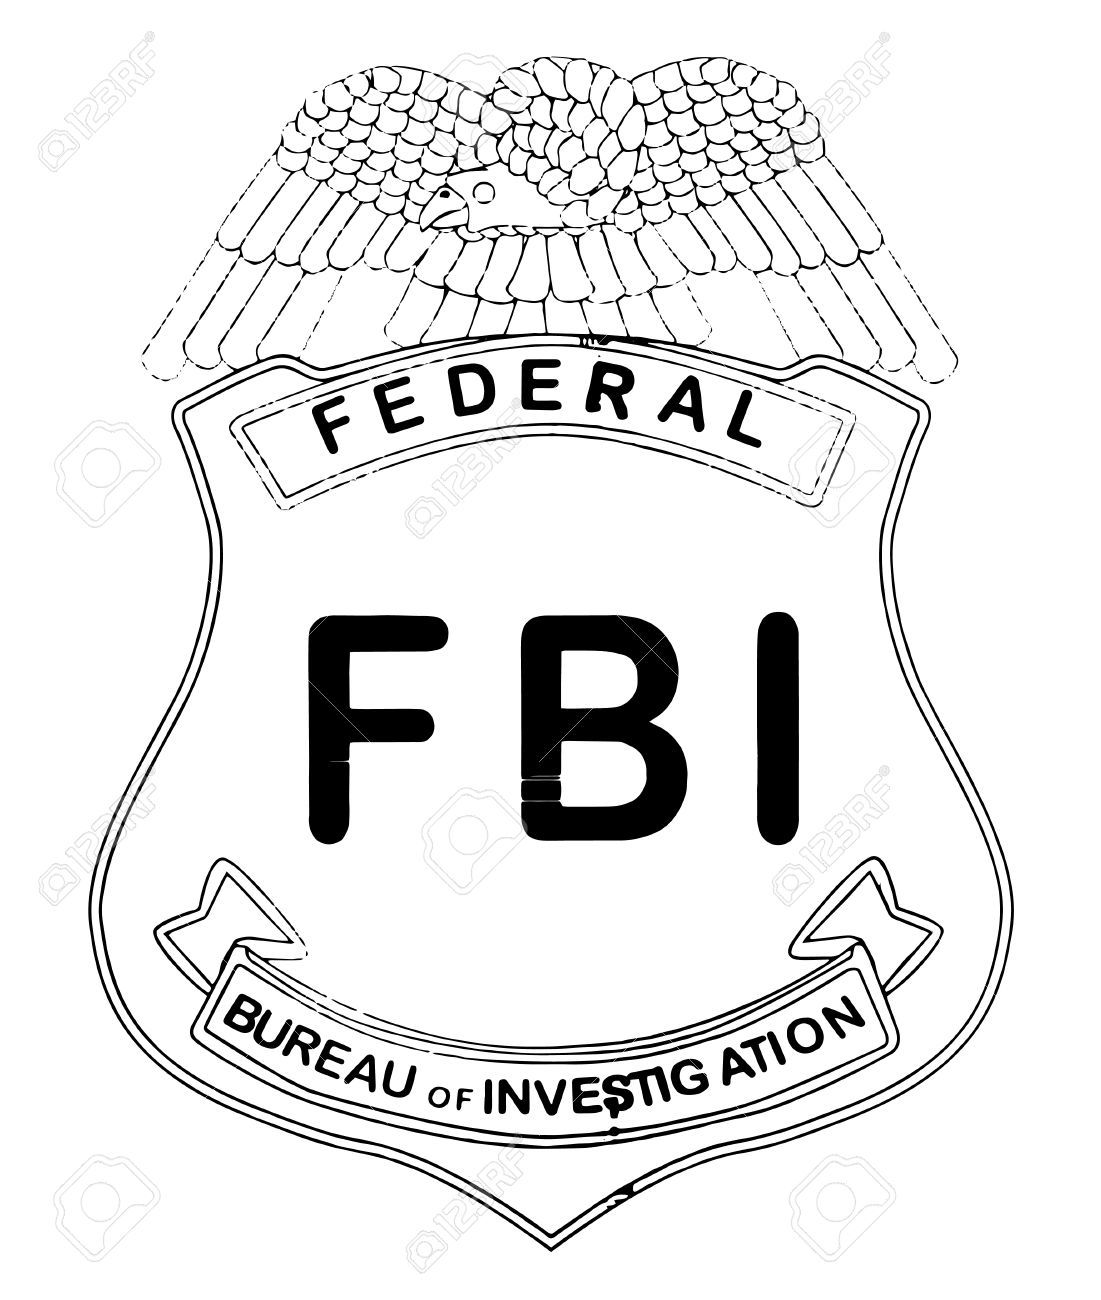 Fbi logo clipart graphic transparent stock Fbi badge clipart 3 » Clipart Portal graphic transparent stock